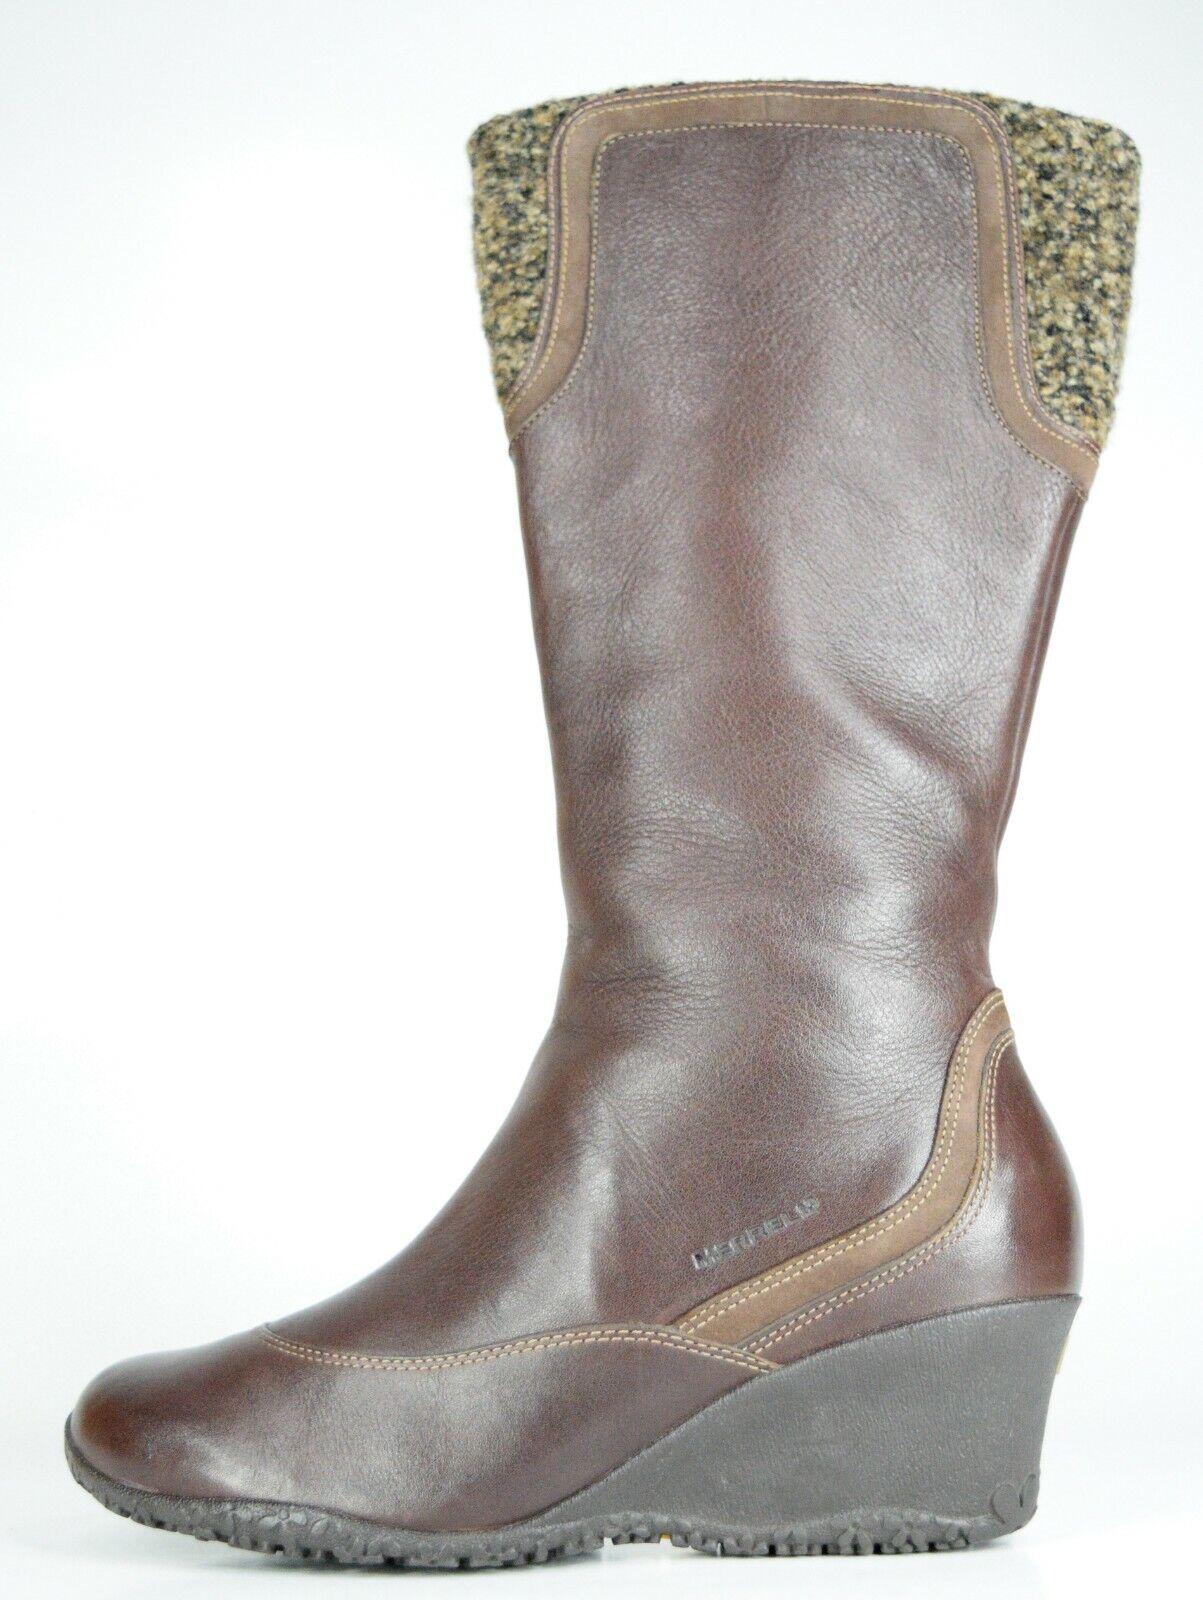 Merrell Larkspur rödträ Wool läder Side Zip Zip Zip Knee High Wedge stövlar Storlek 7.5 M  100% fri frakt